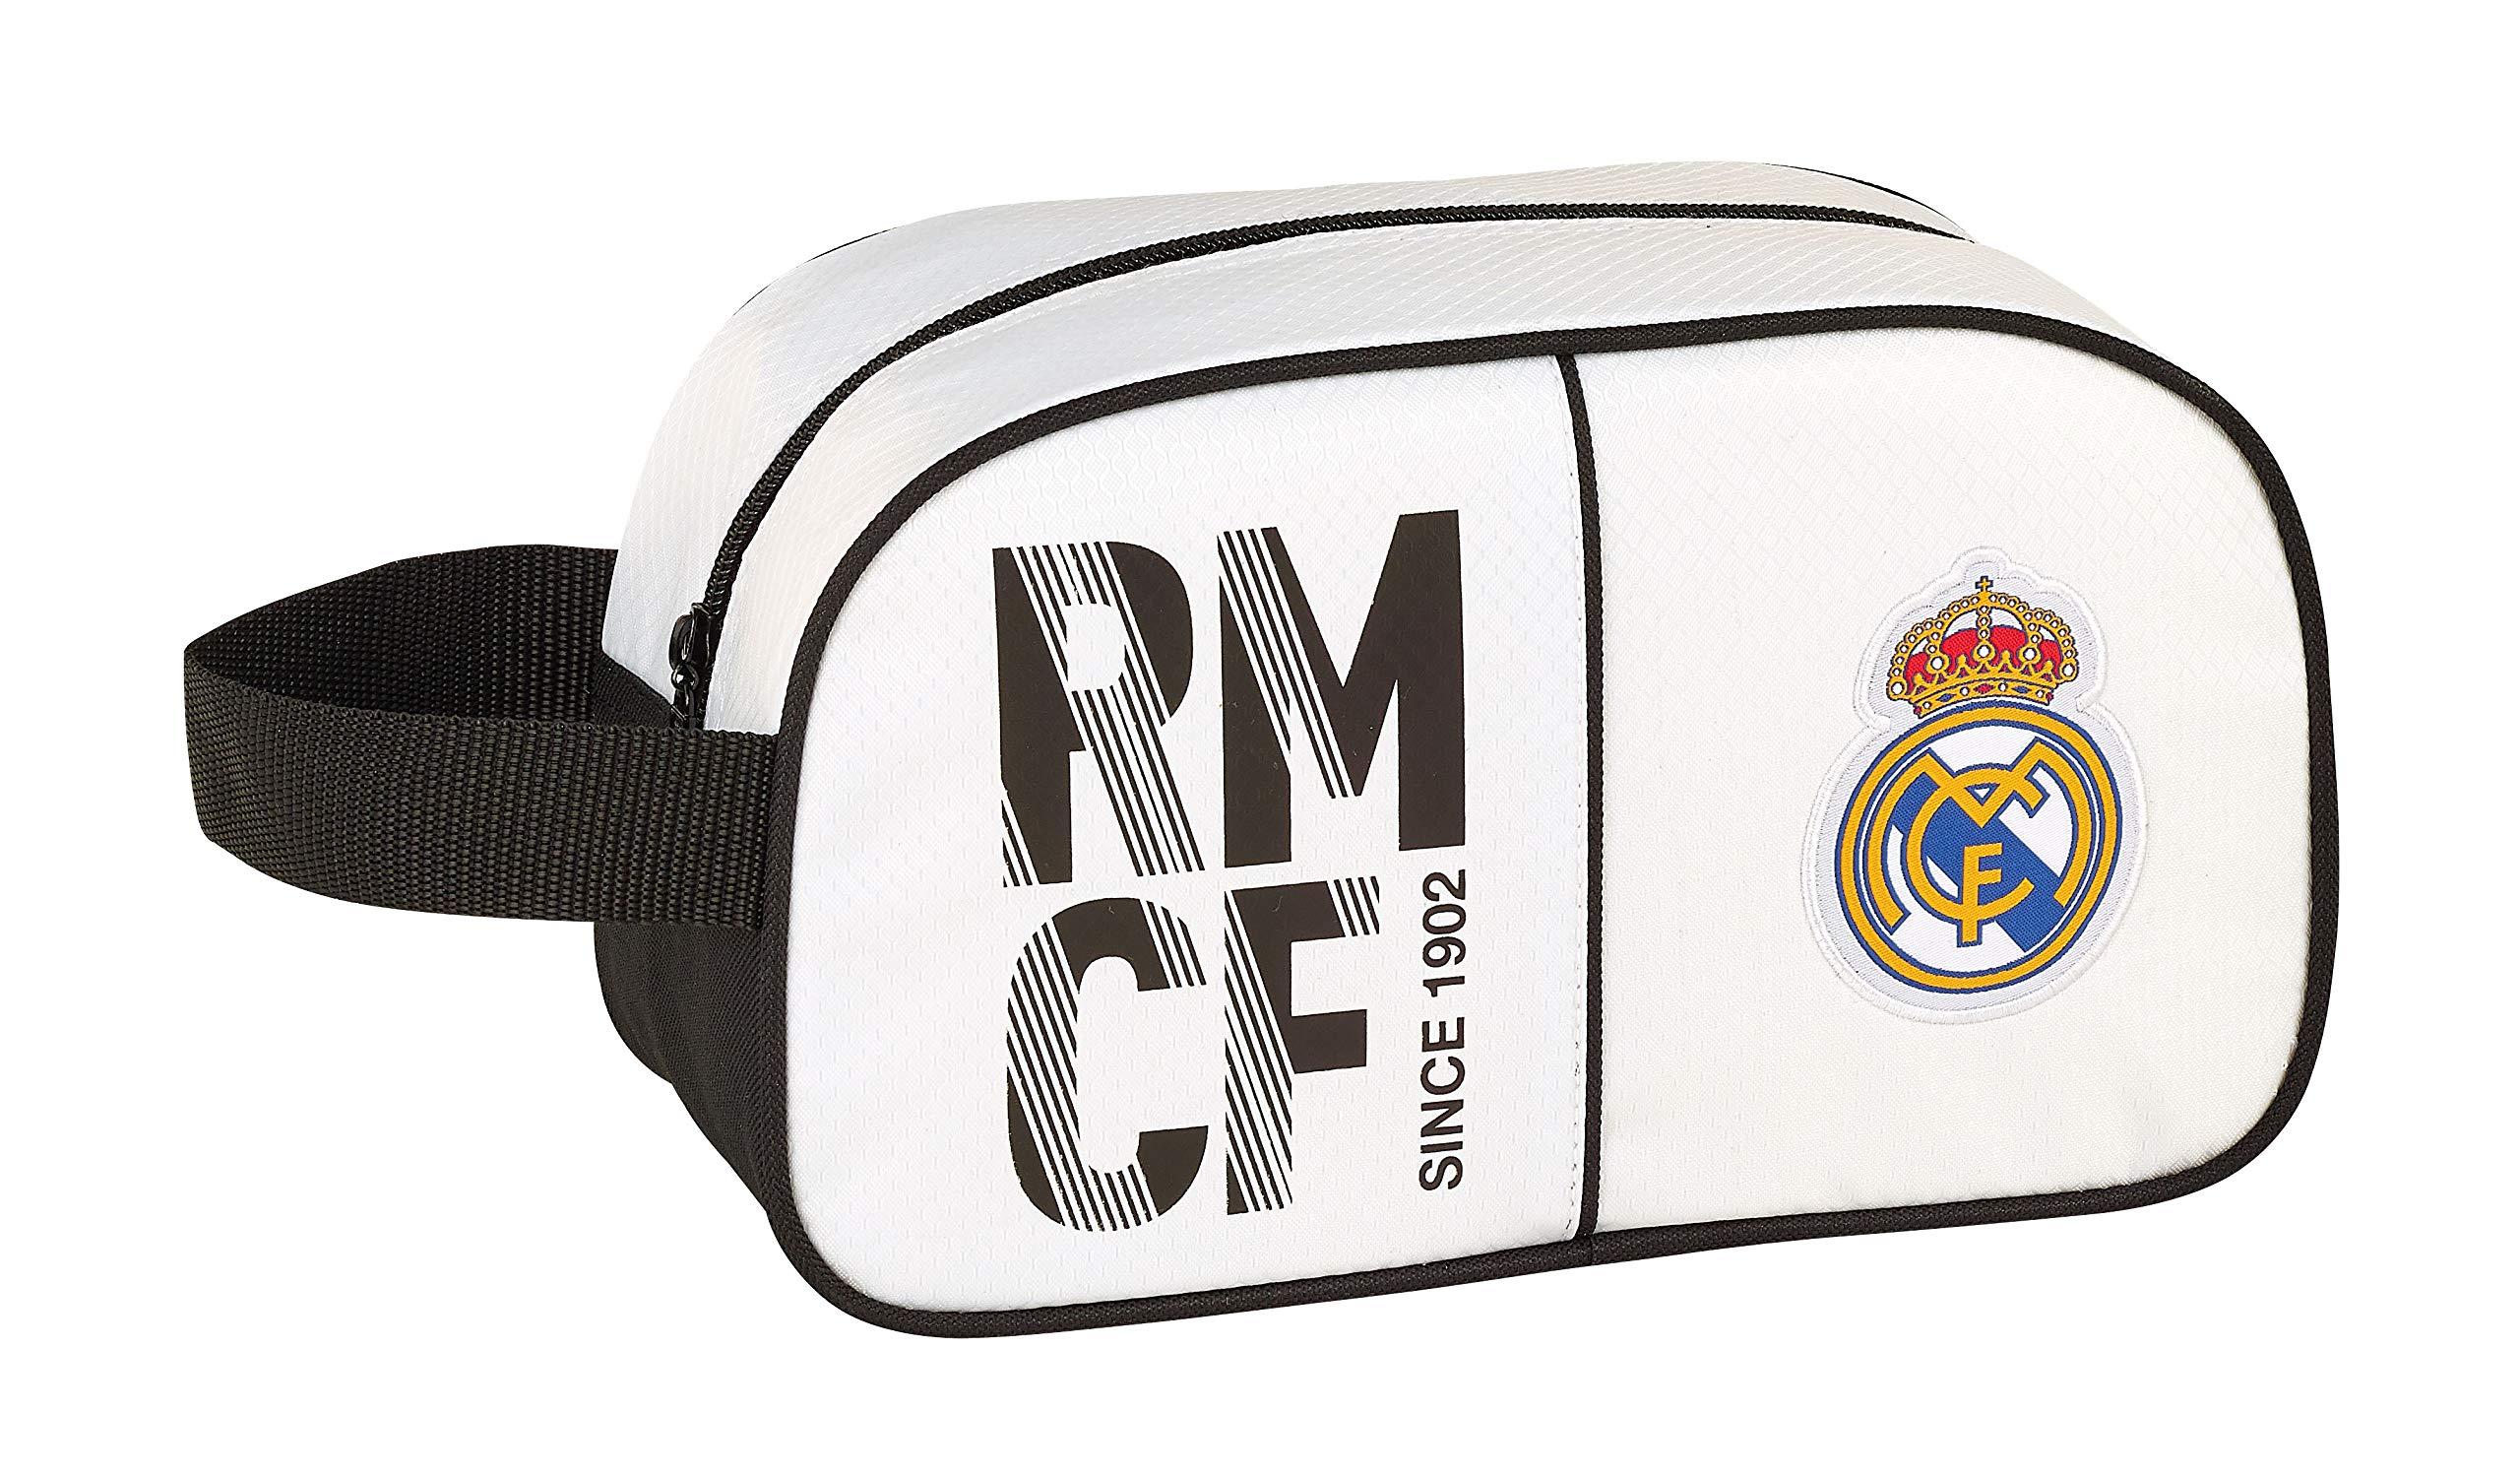 Real Madrid 811854248 2018 Bolsa de Aseo, 26 cm, Blanco